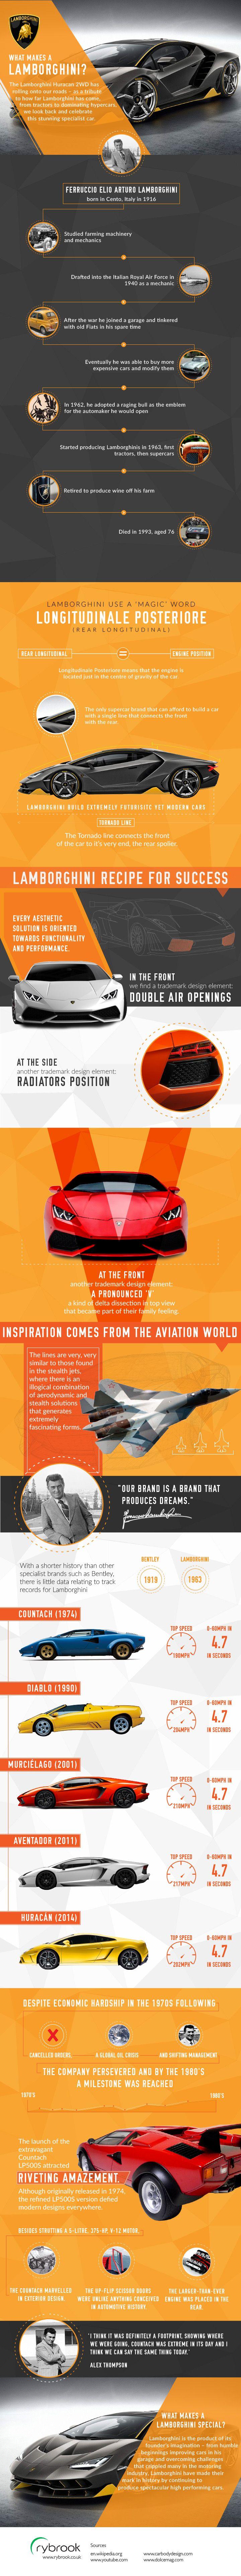 What Makes A Lamborghini? #supercars #specialistcars #motoring